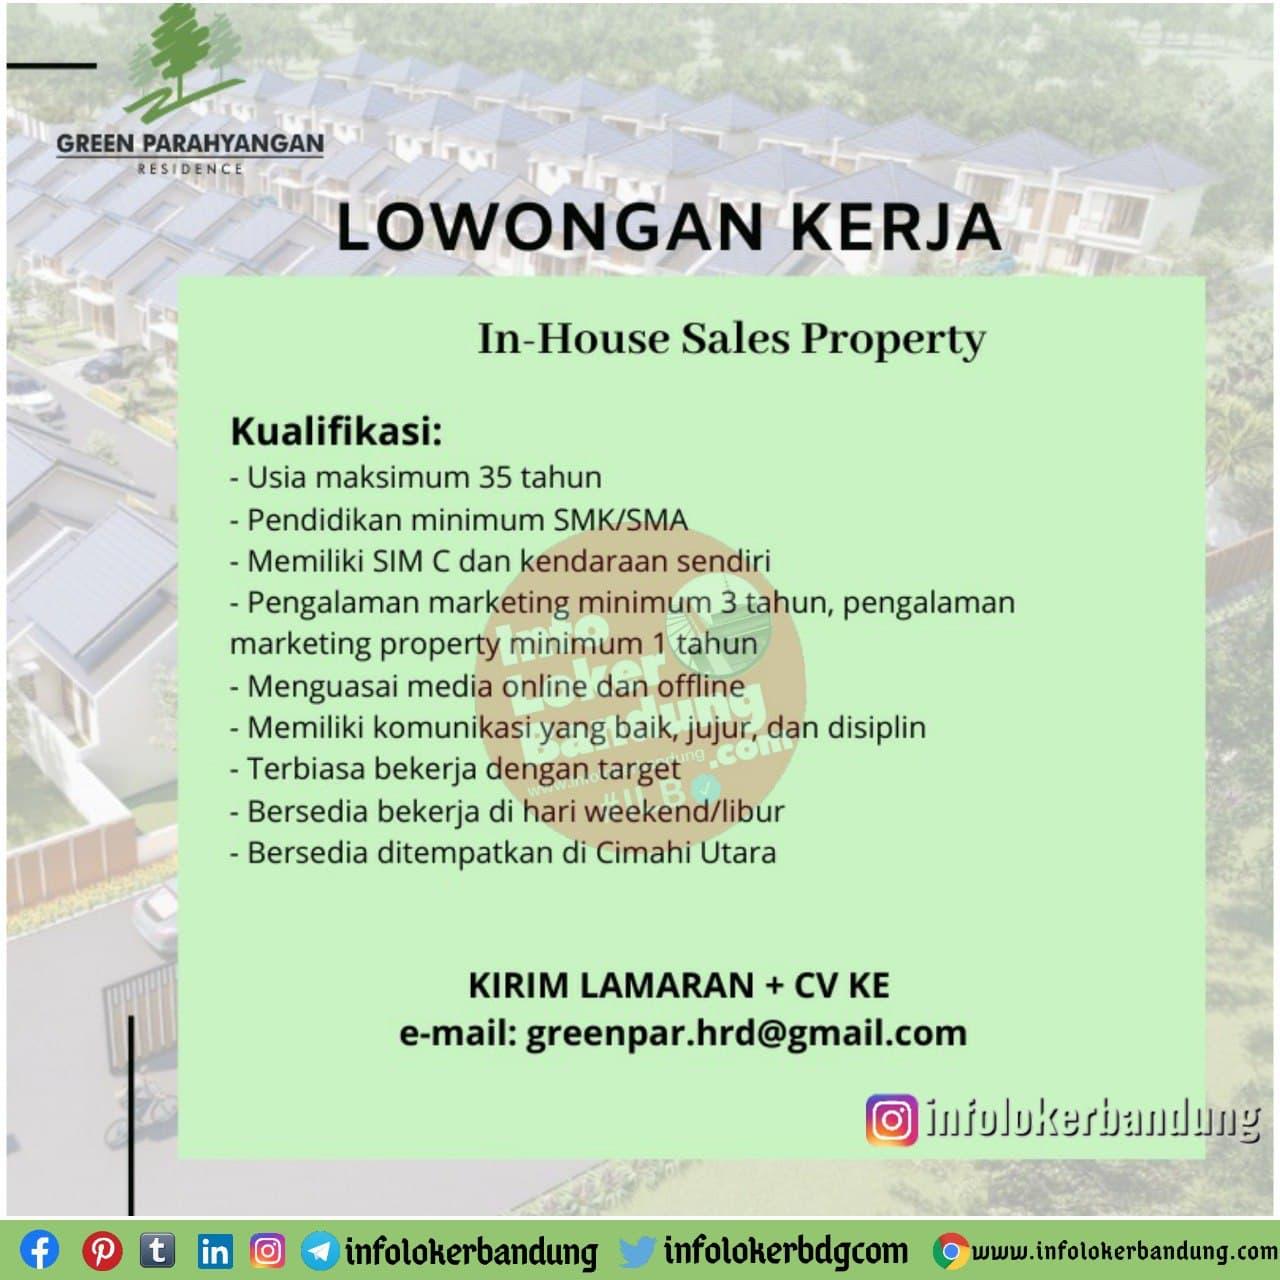 Lowongan Kerja In House Sales Property Green Parahyangan Bandung Januari 2021 Info Loker Bandung 2021